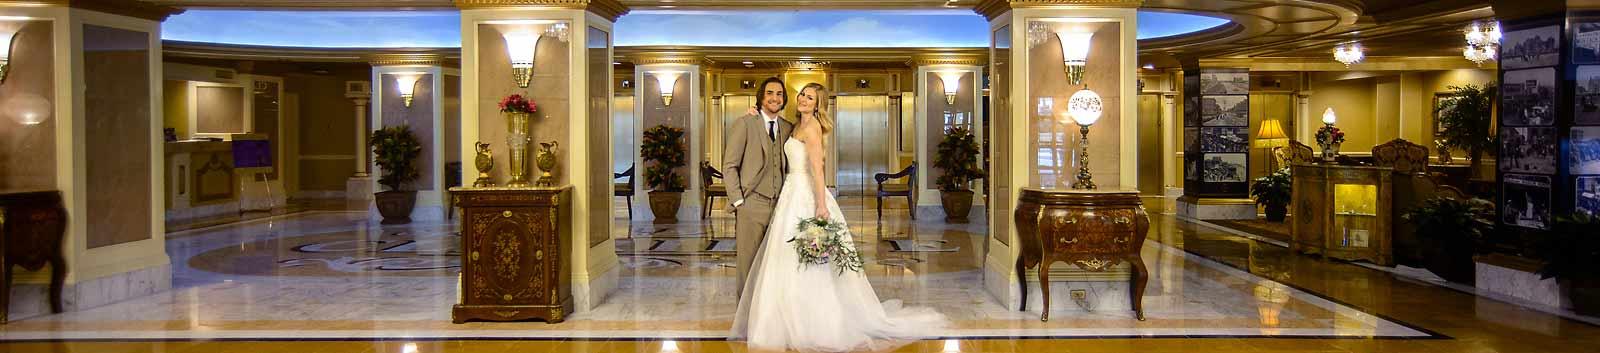 atlantic city weddings and wedding venues near atlantic city header from the claridge a radisson hotel